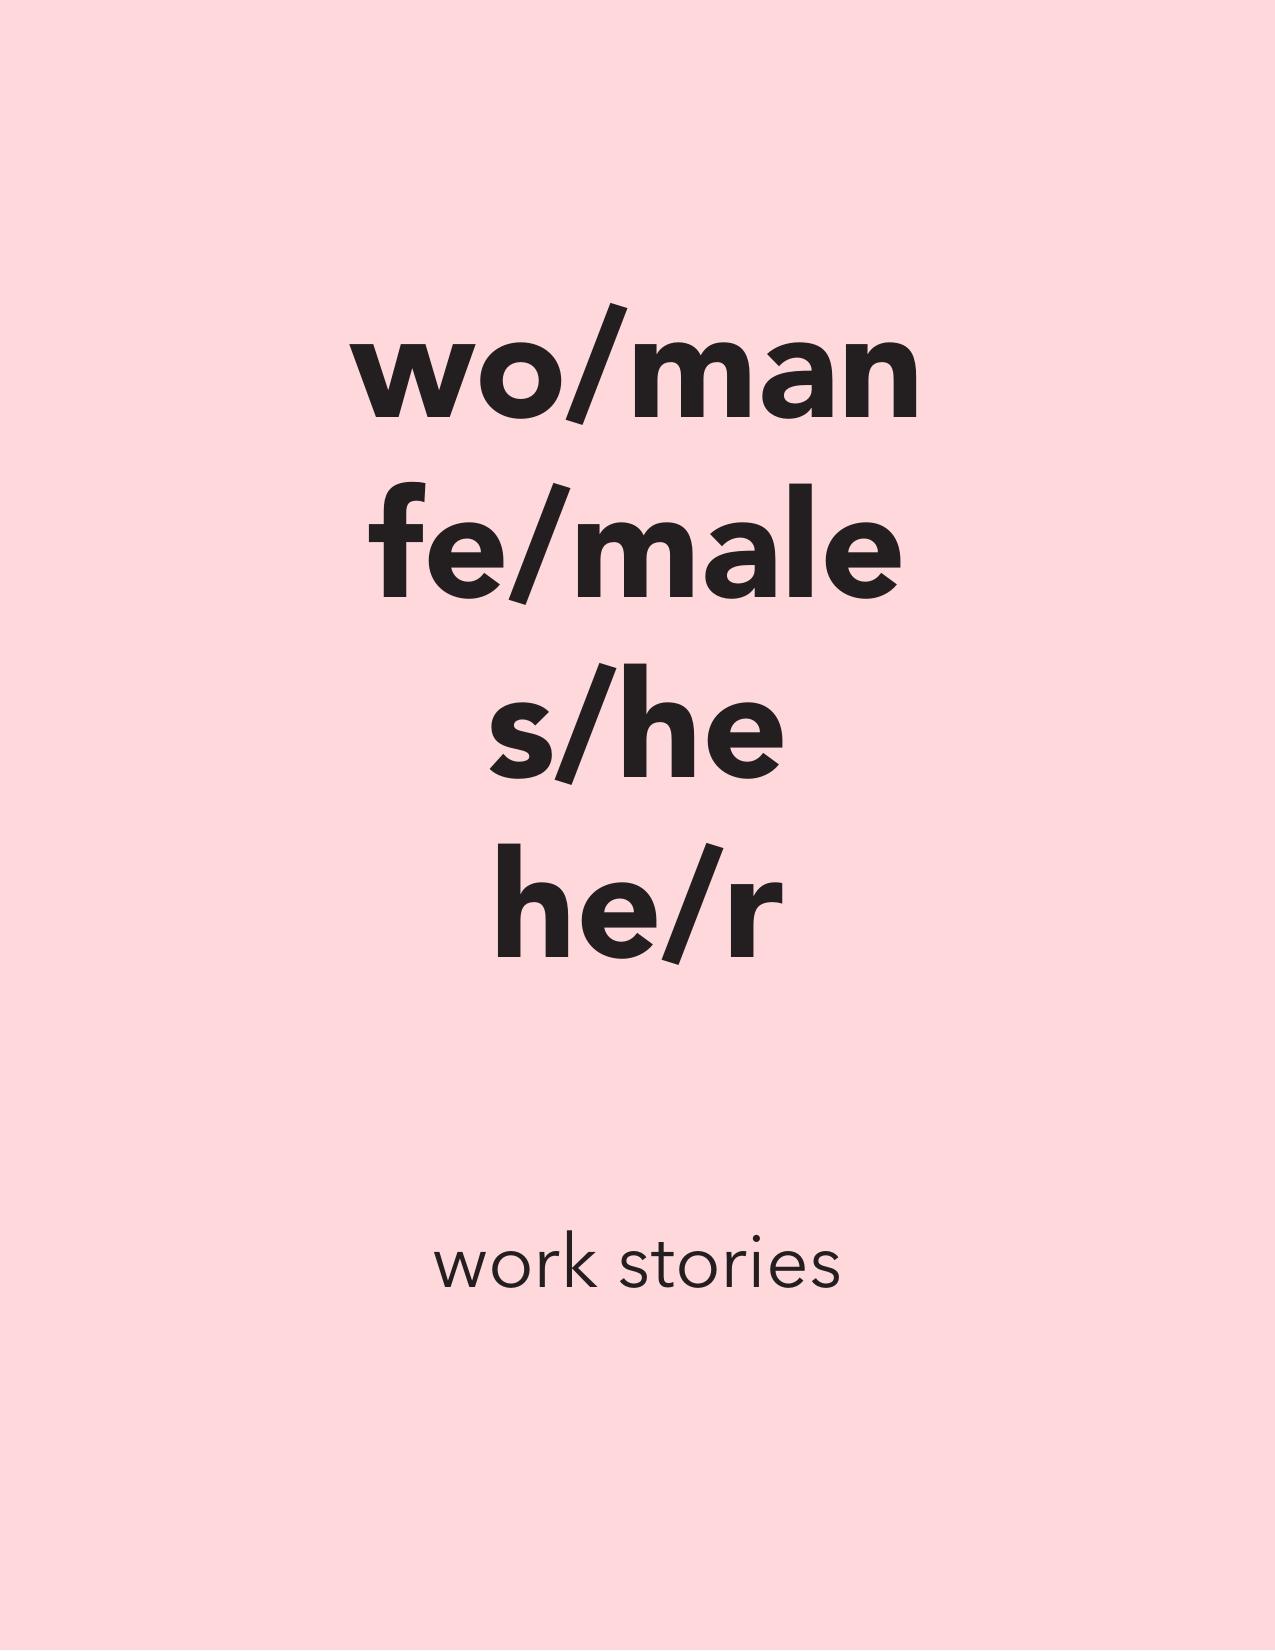 wo:man work stories.jpg